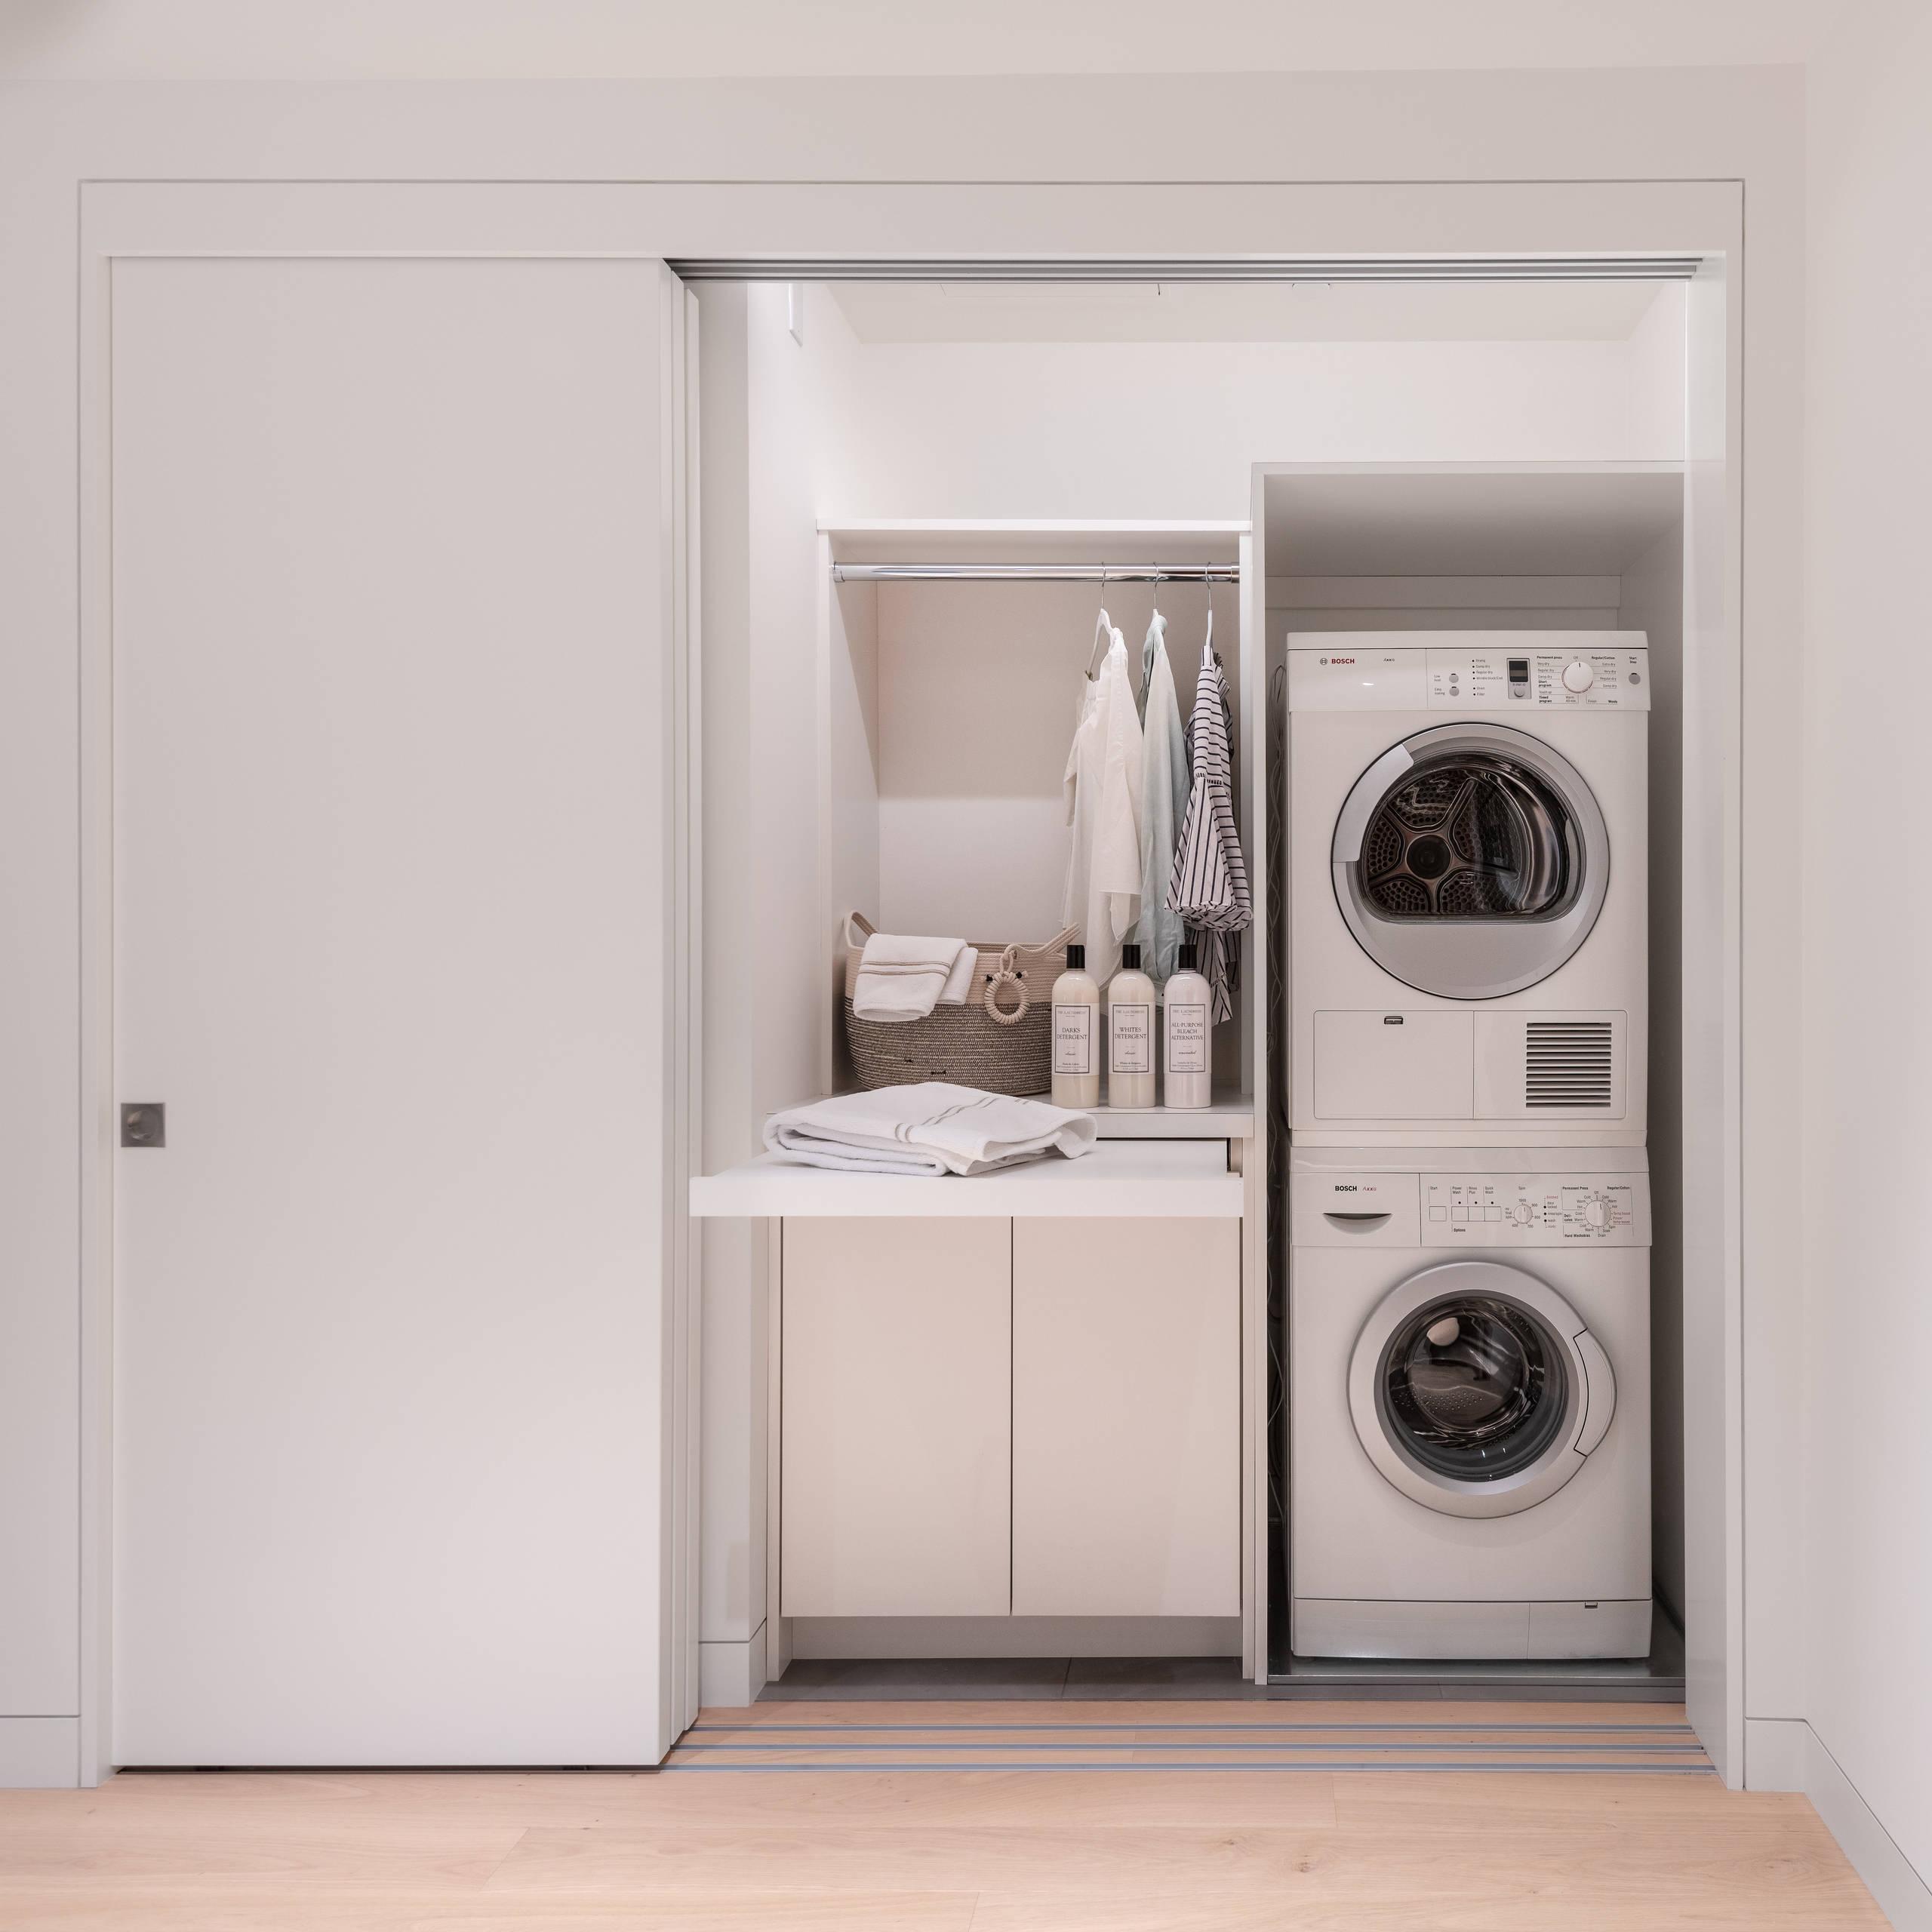 Laundry Closet Pictures Ideas